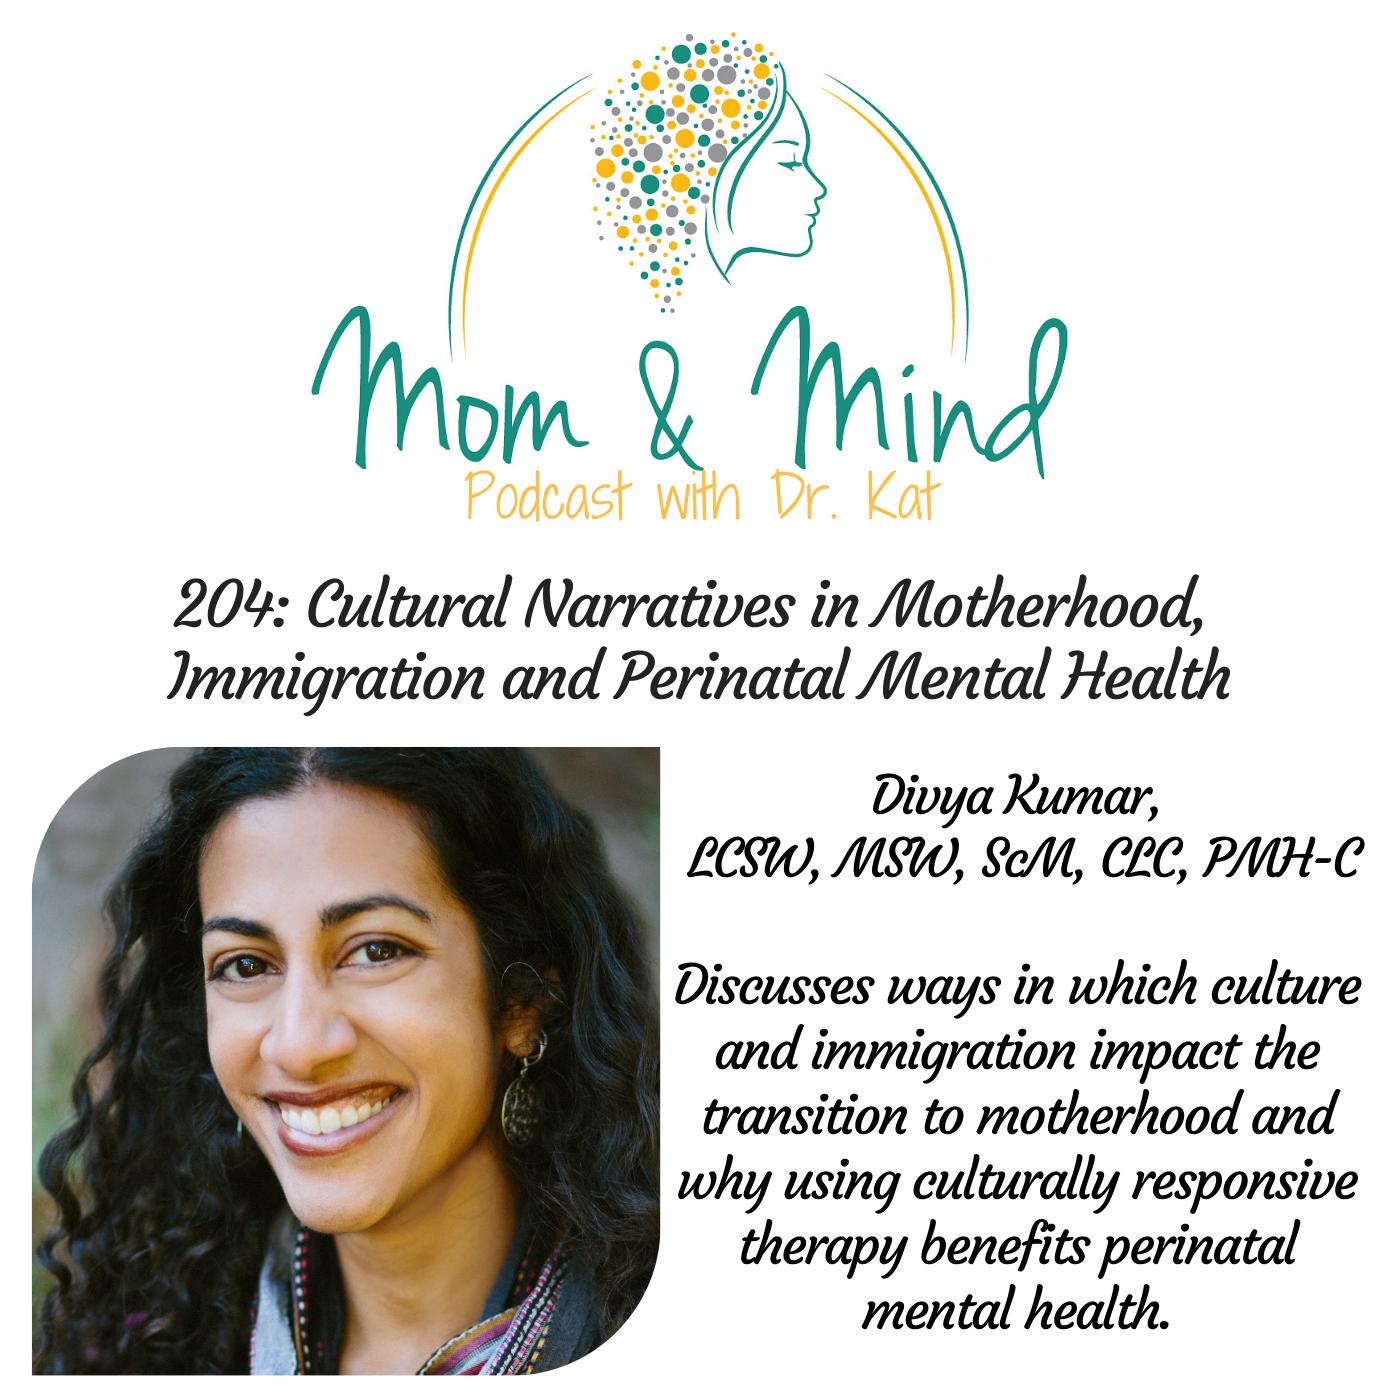 204: Cultural Narratives in Motherhood, Immigration and Perinatal Mental Health